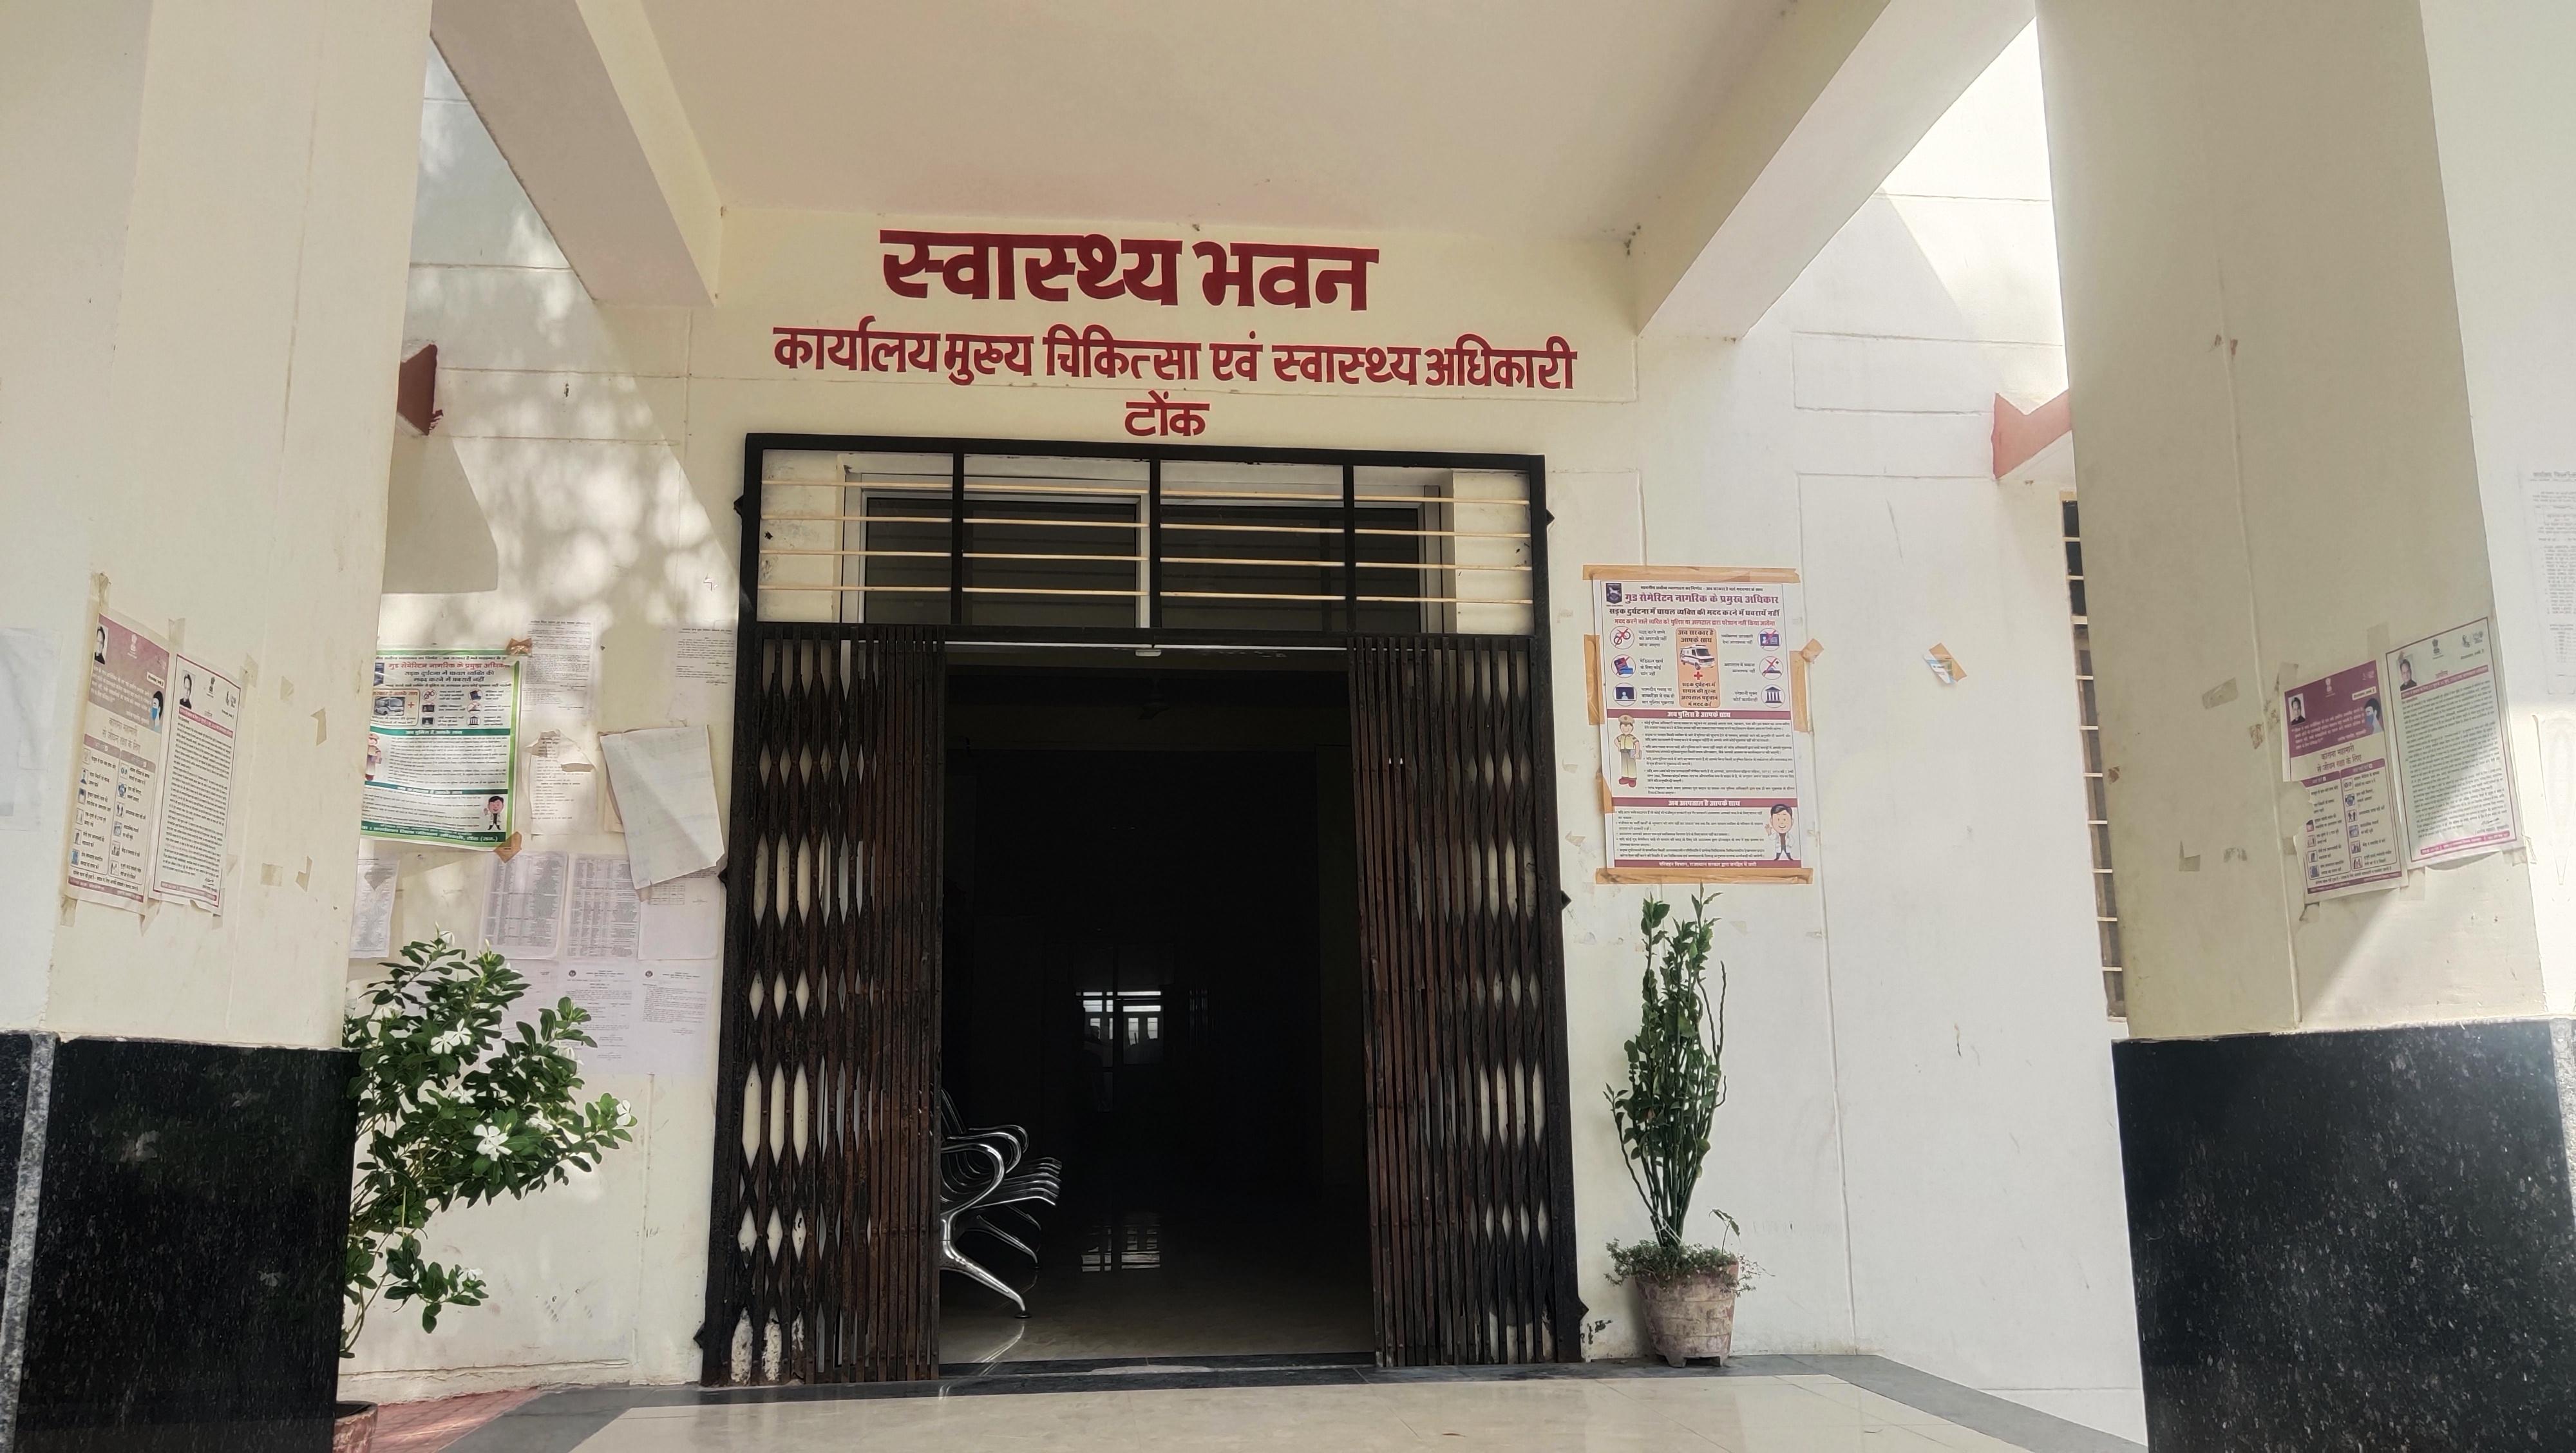 सीएमएचओ कार्यालय। - Dainik Bhaskar